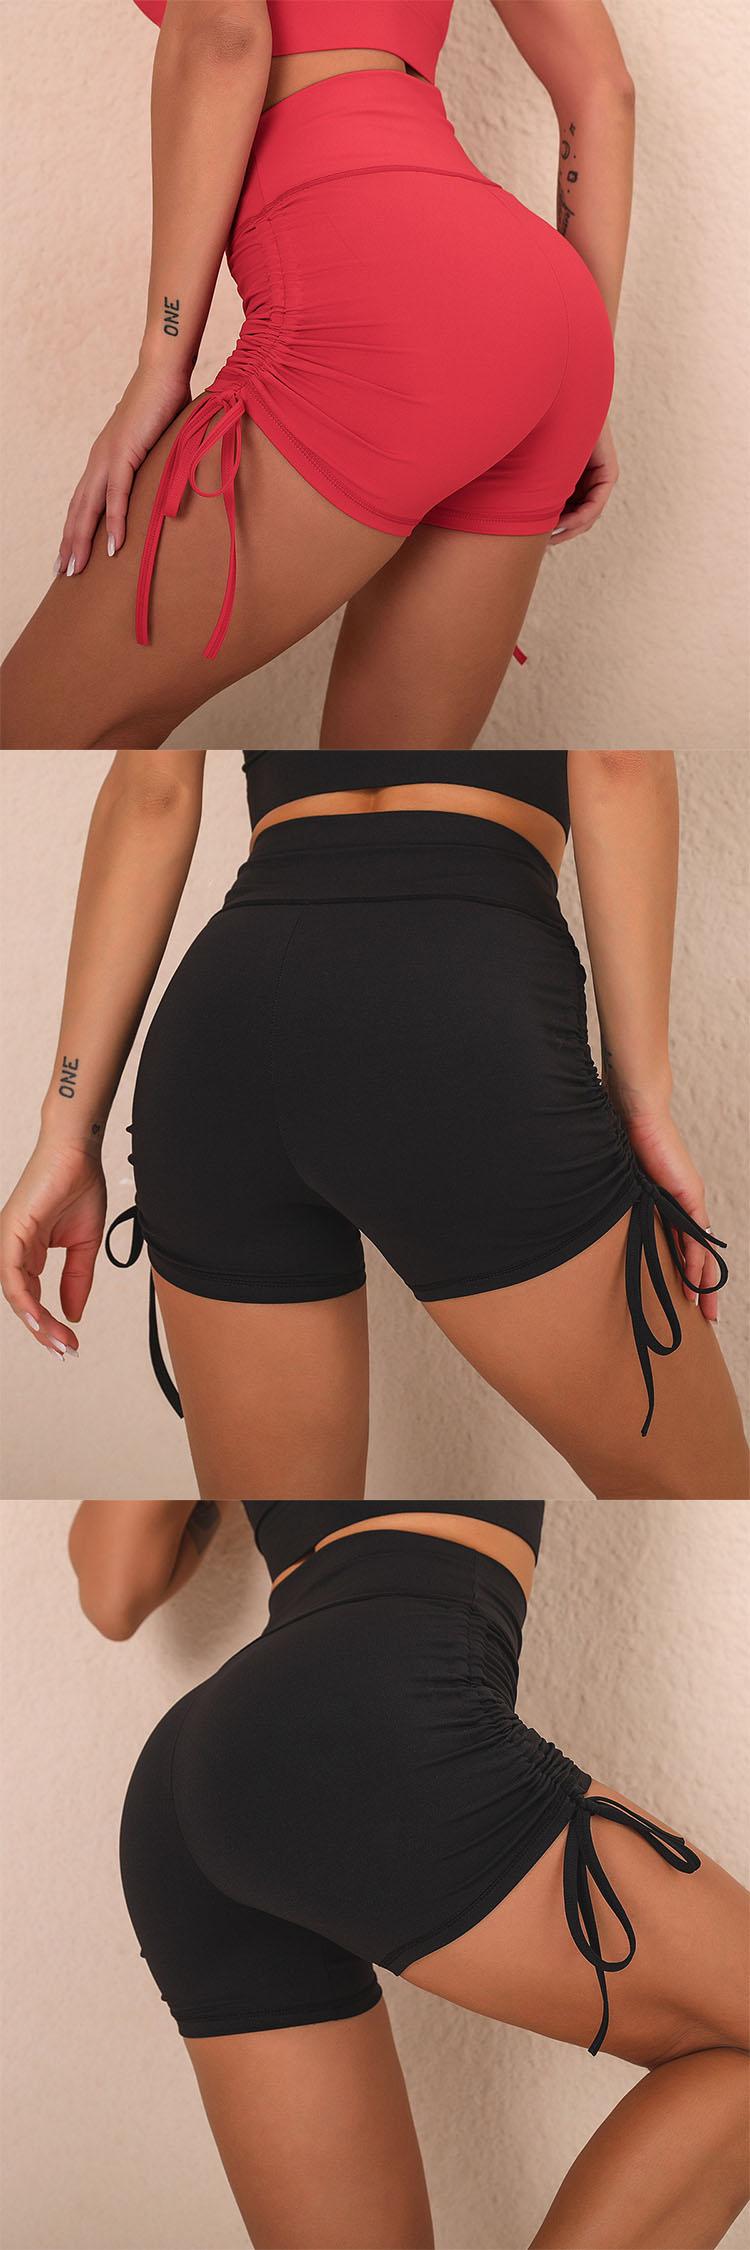 Irregular belt pattern, vaguely presented, fashionable and generous.